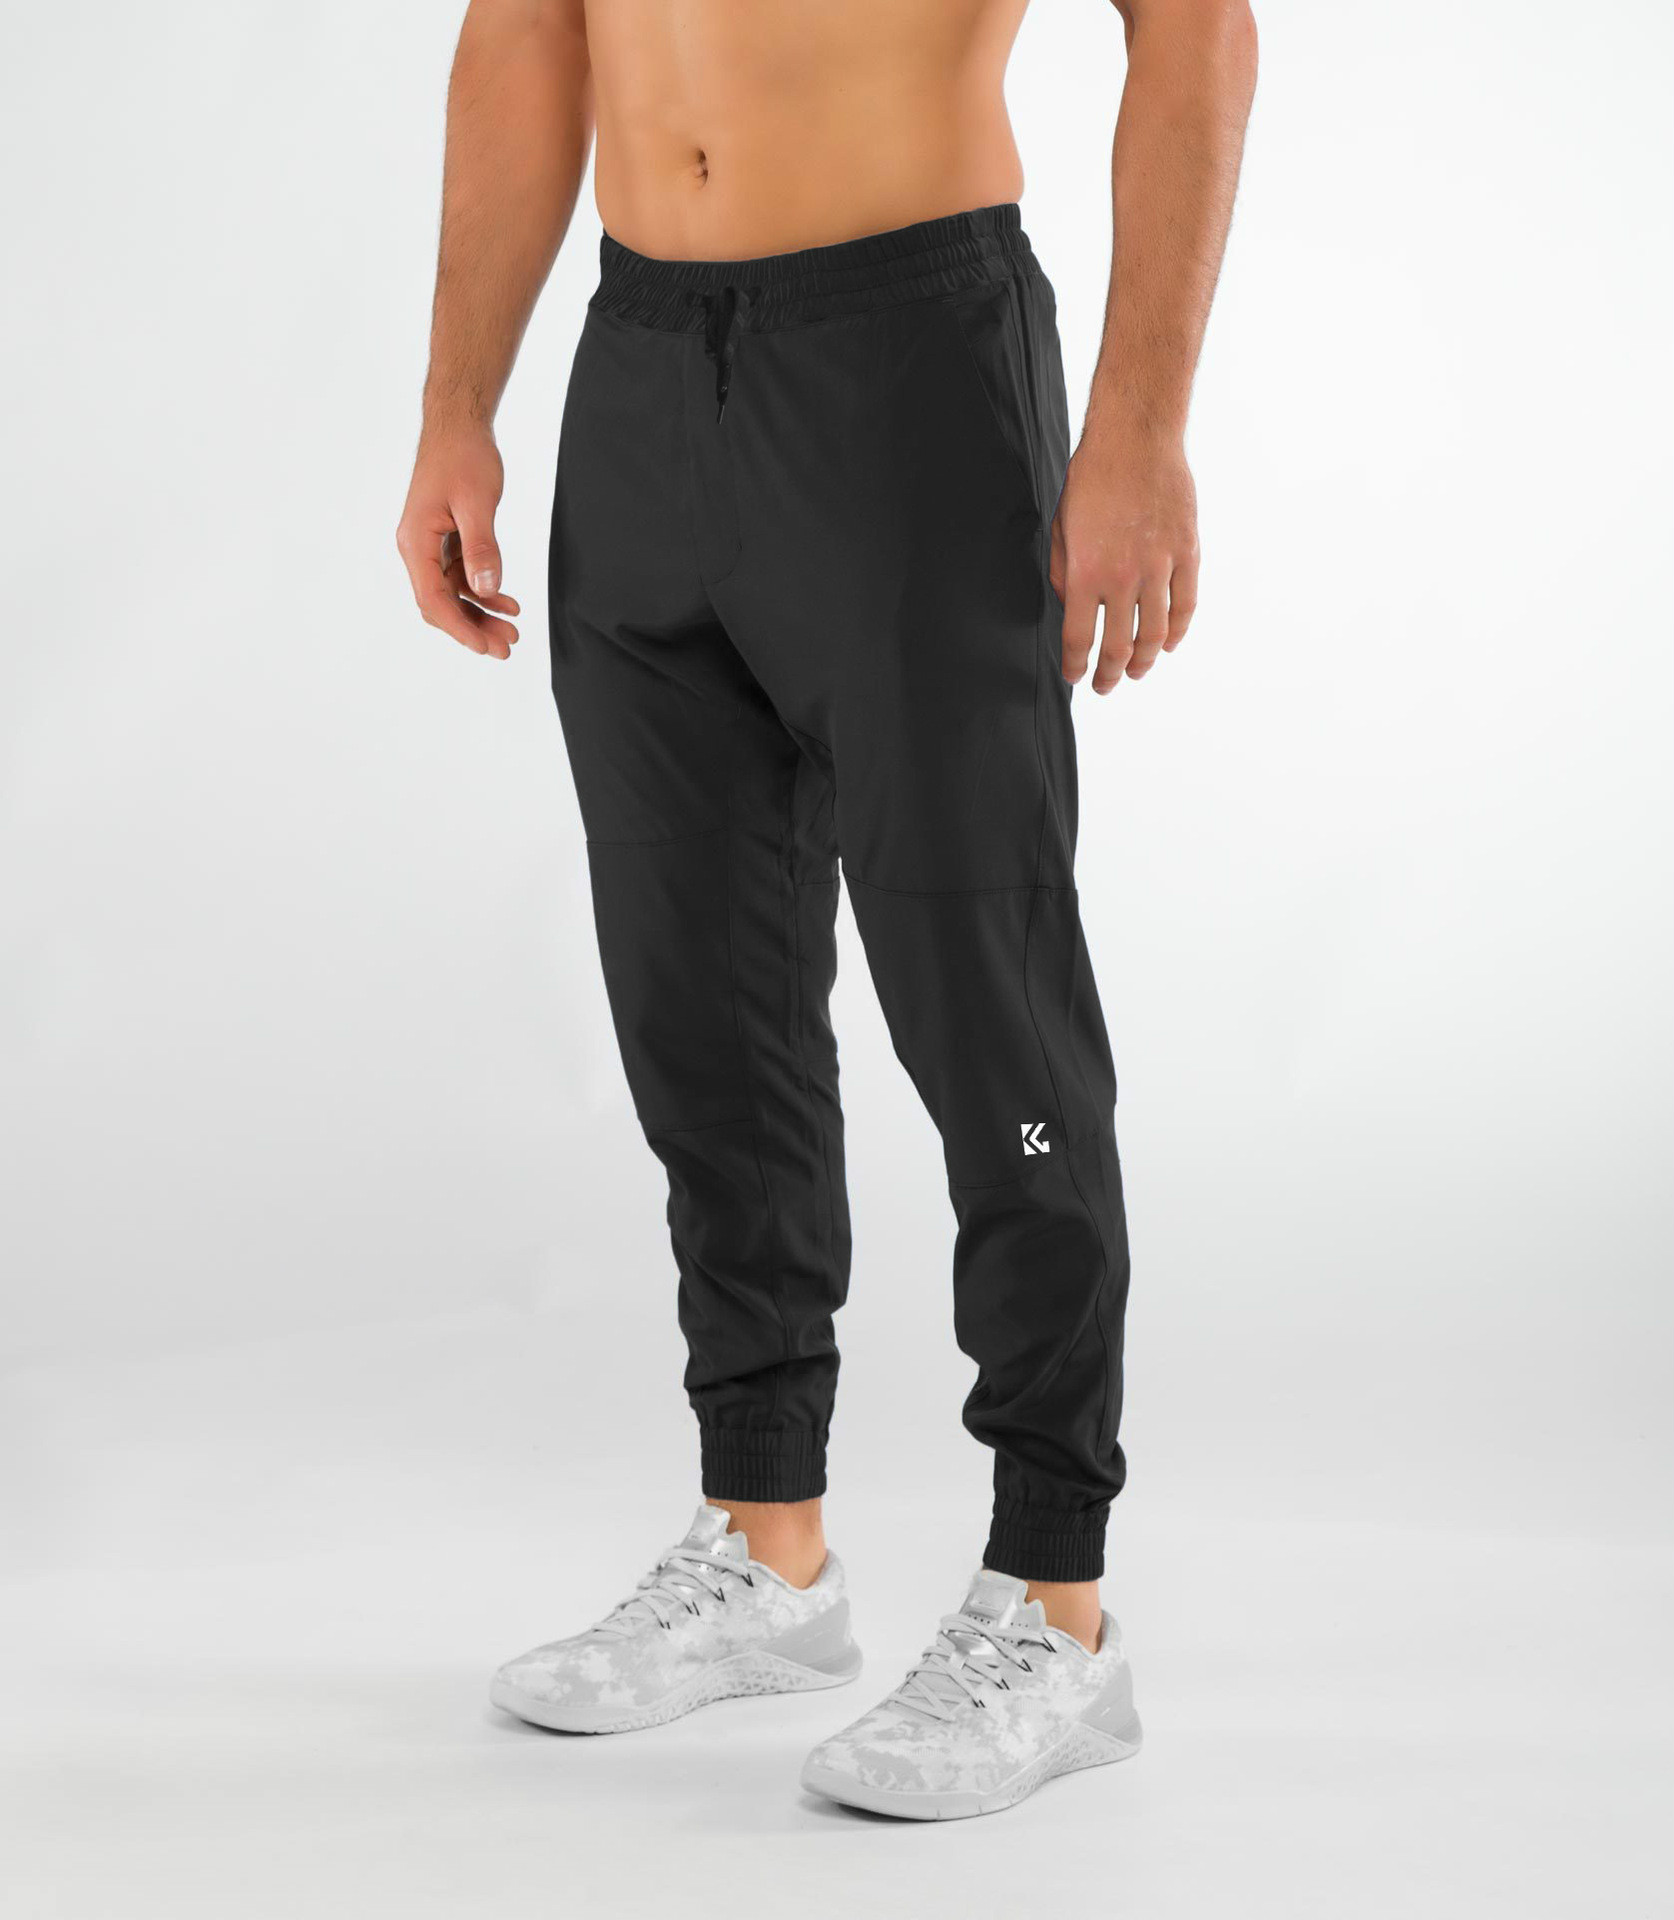 2019 Men New Sweatpants Wind Pants Casual Jogger Sportswear Men Workout Trousers Hight Elasticity Track Pants Men Pants